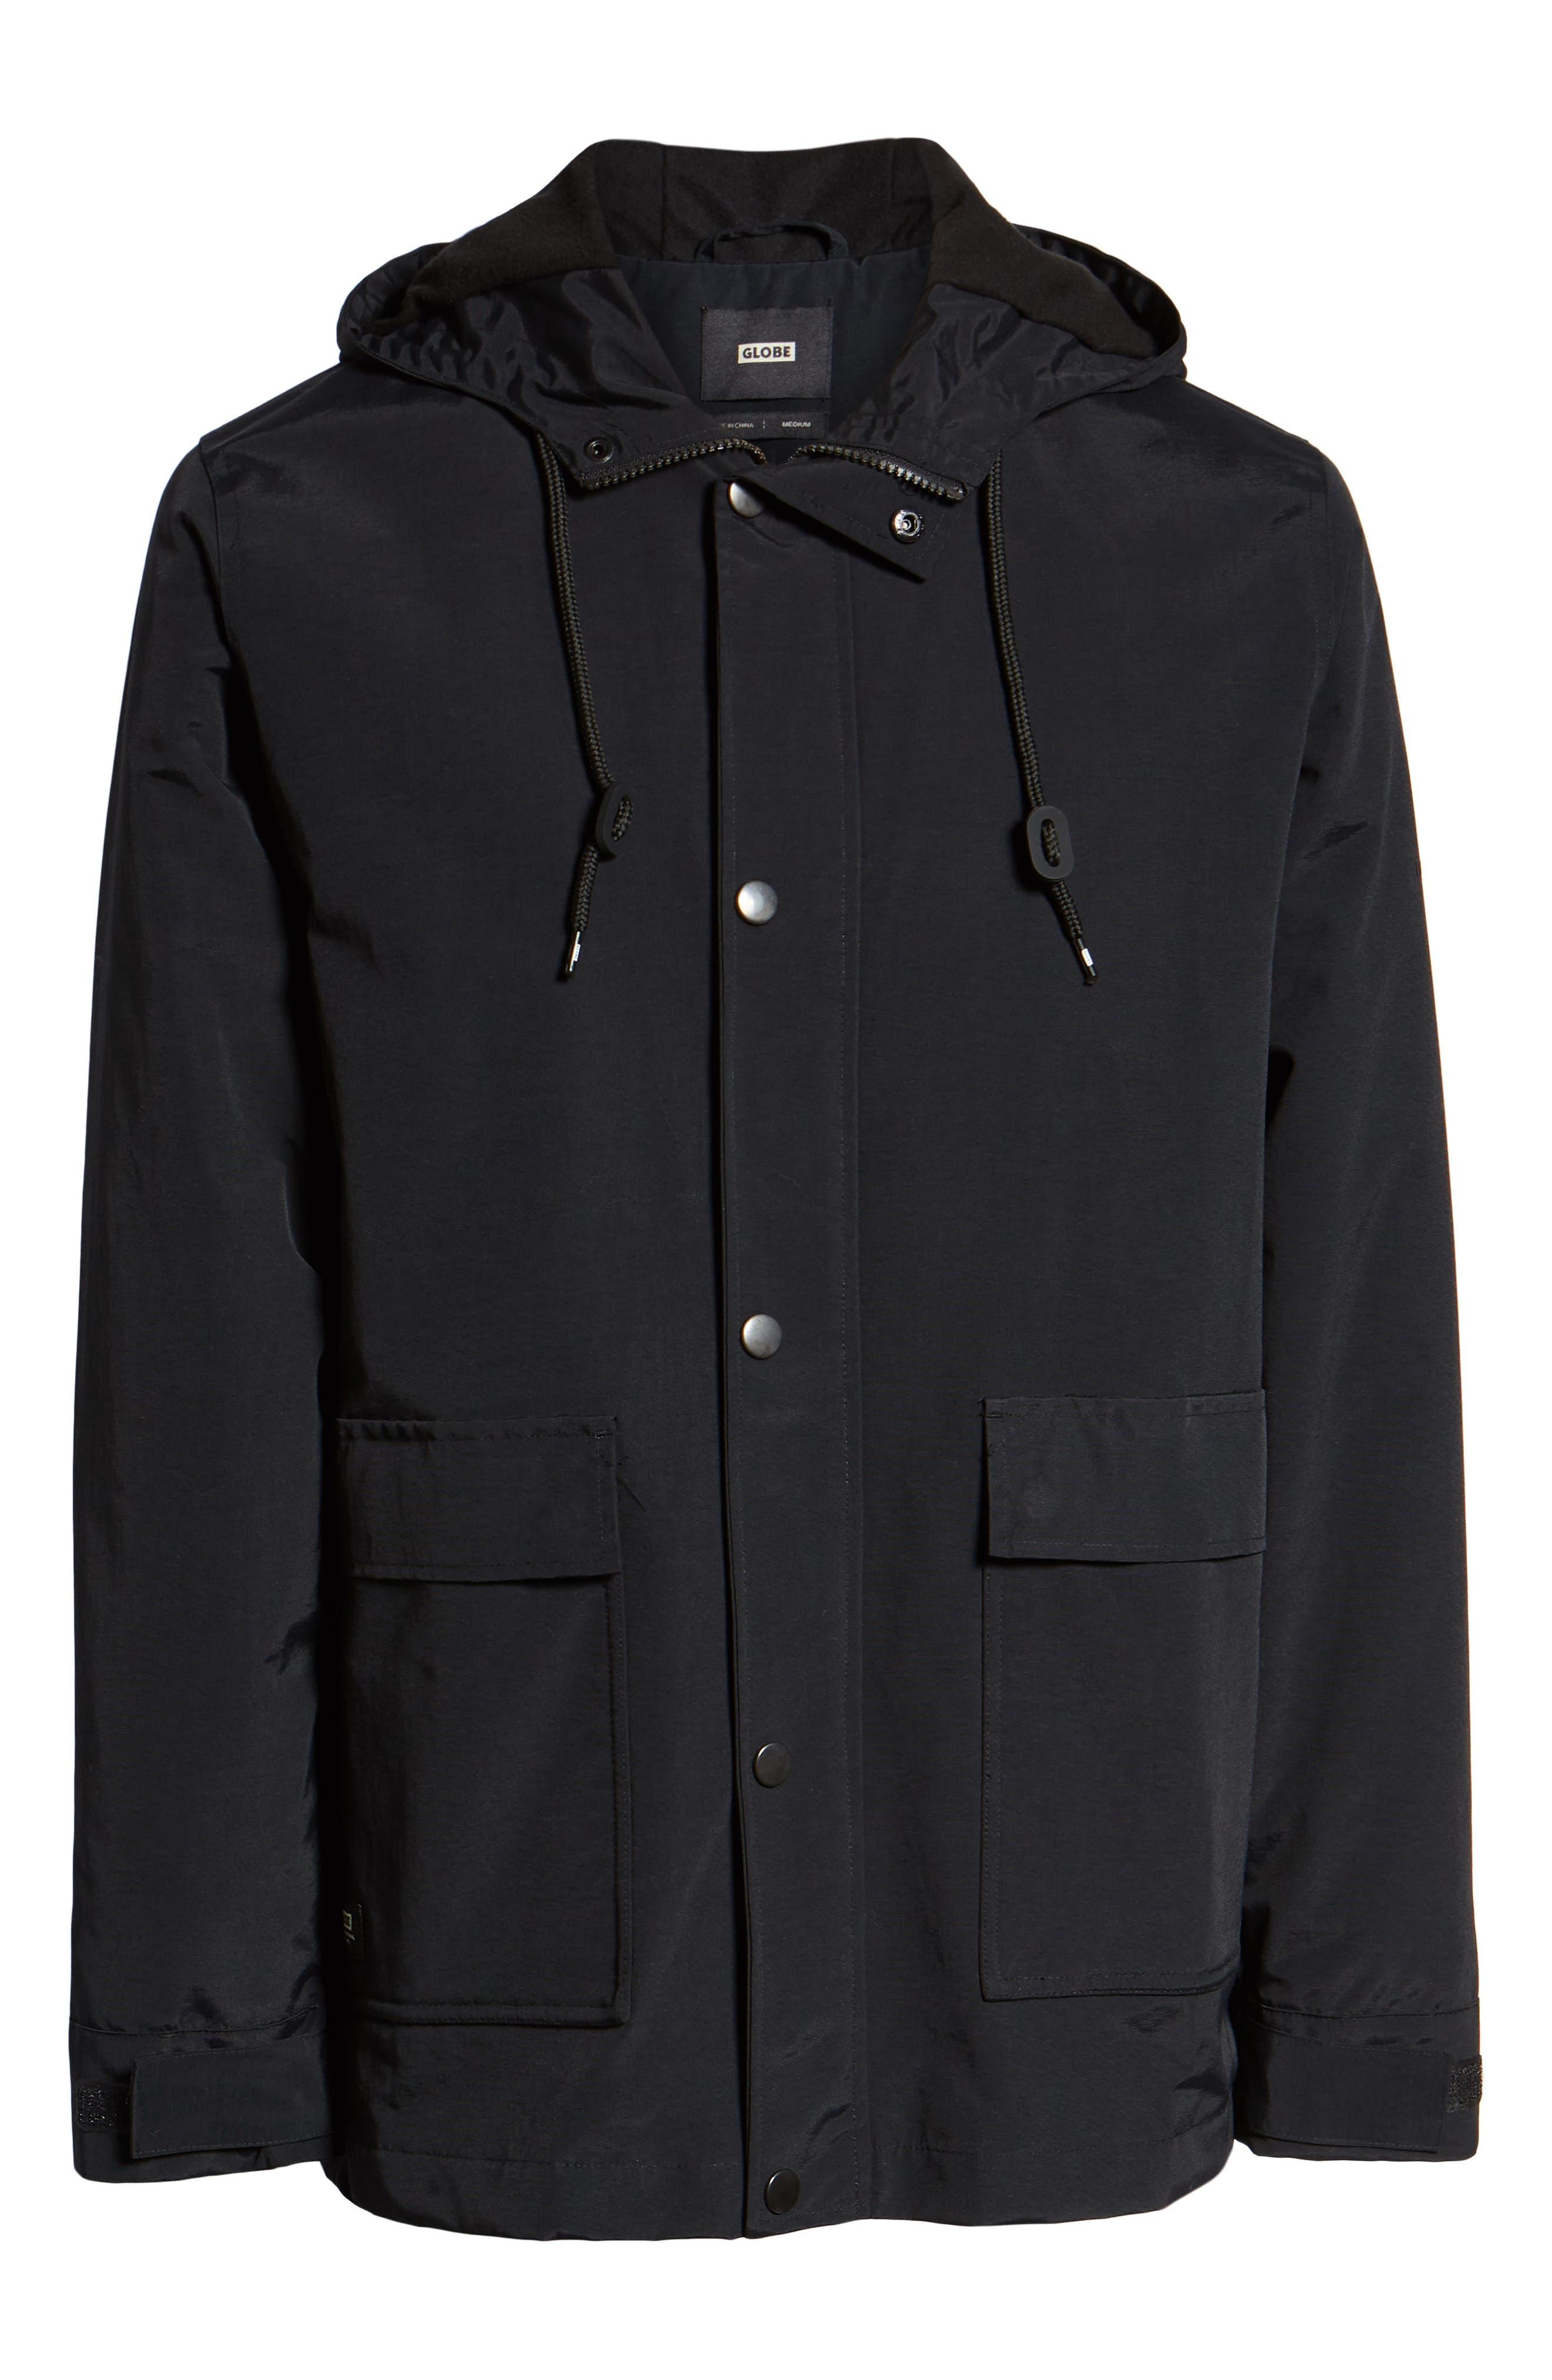 Goodstock Utility Jacket,                             Alternate thumbnail 6, color,                             BLACK